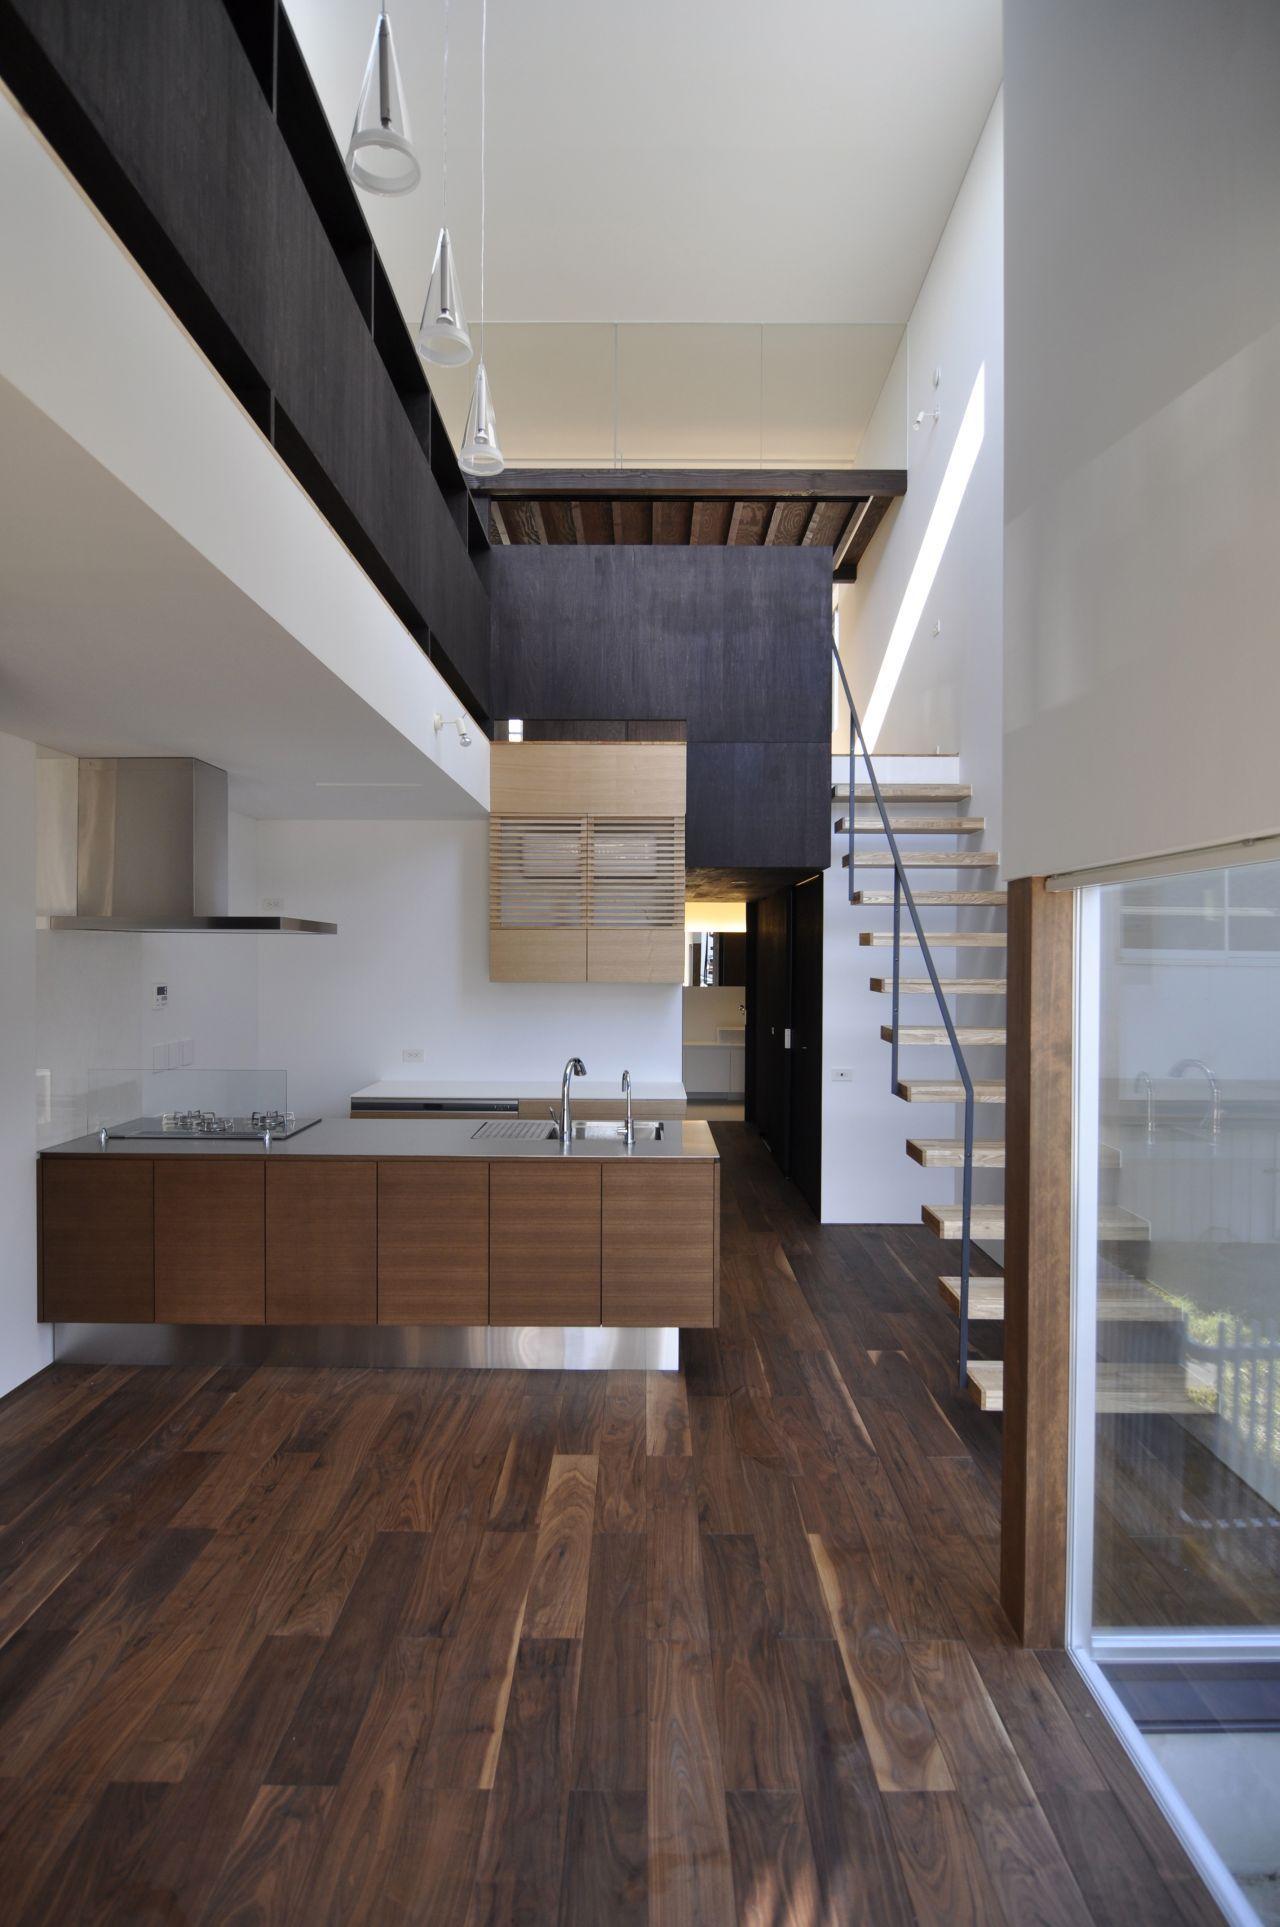 Galer a de casa e d i g architects 8 for Interior design 6 october